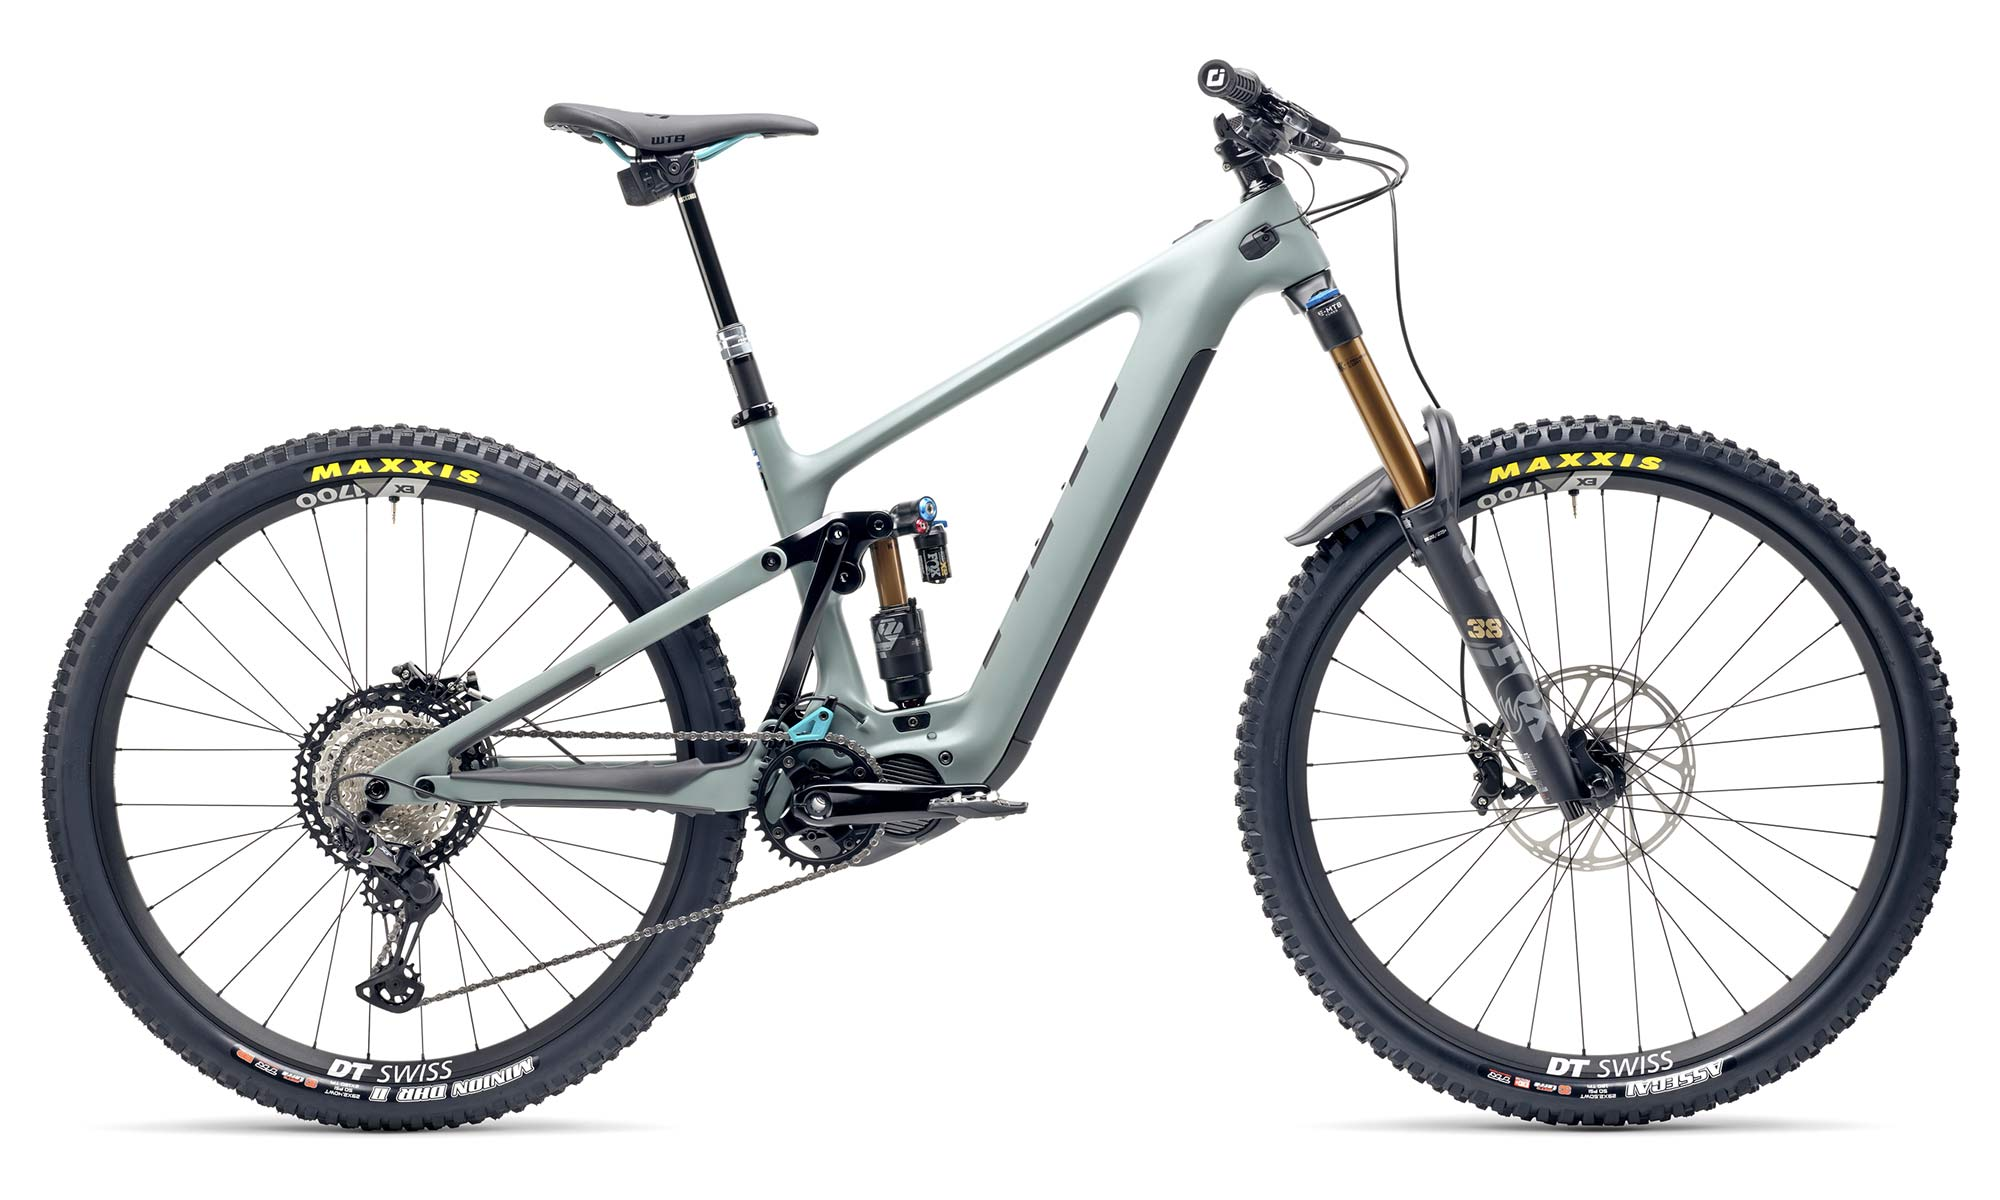 Yeti 160E EWS racing e-bike, all-new 6-bar suspension carbon 160mm eMTB,T1 gray complete